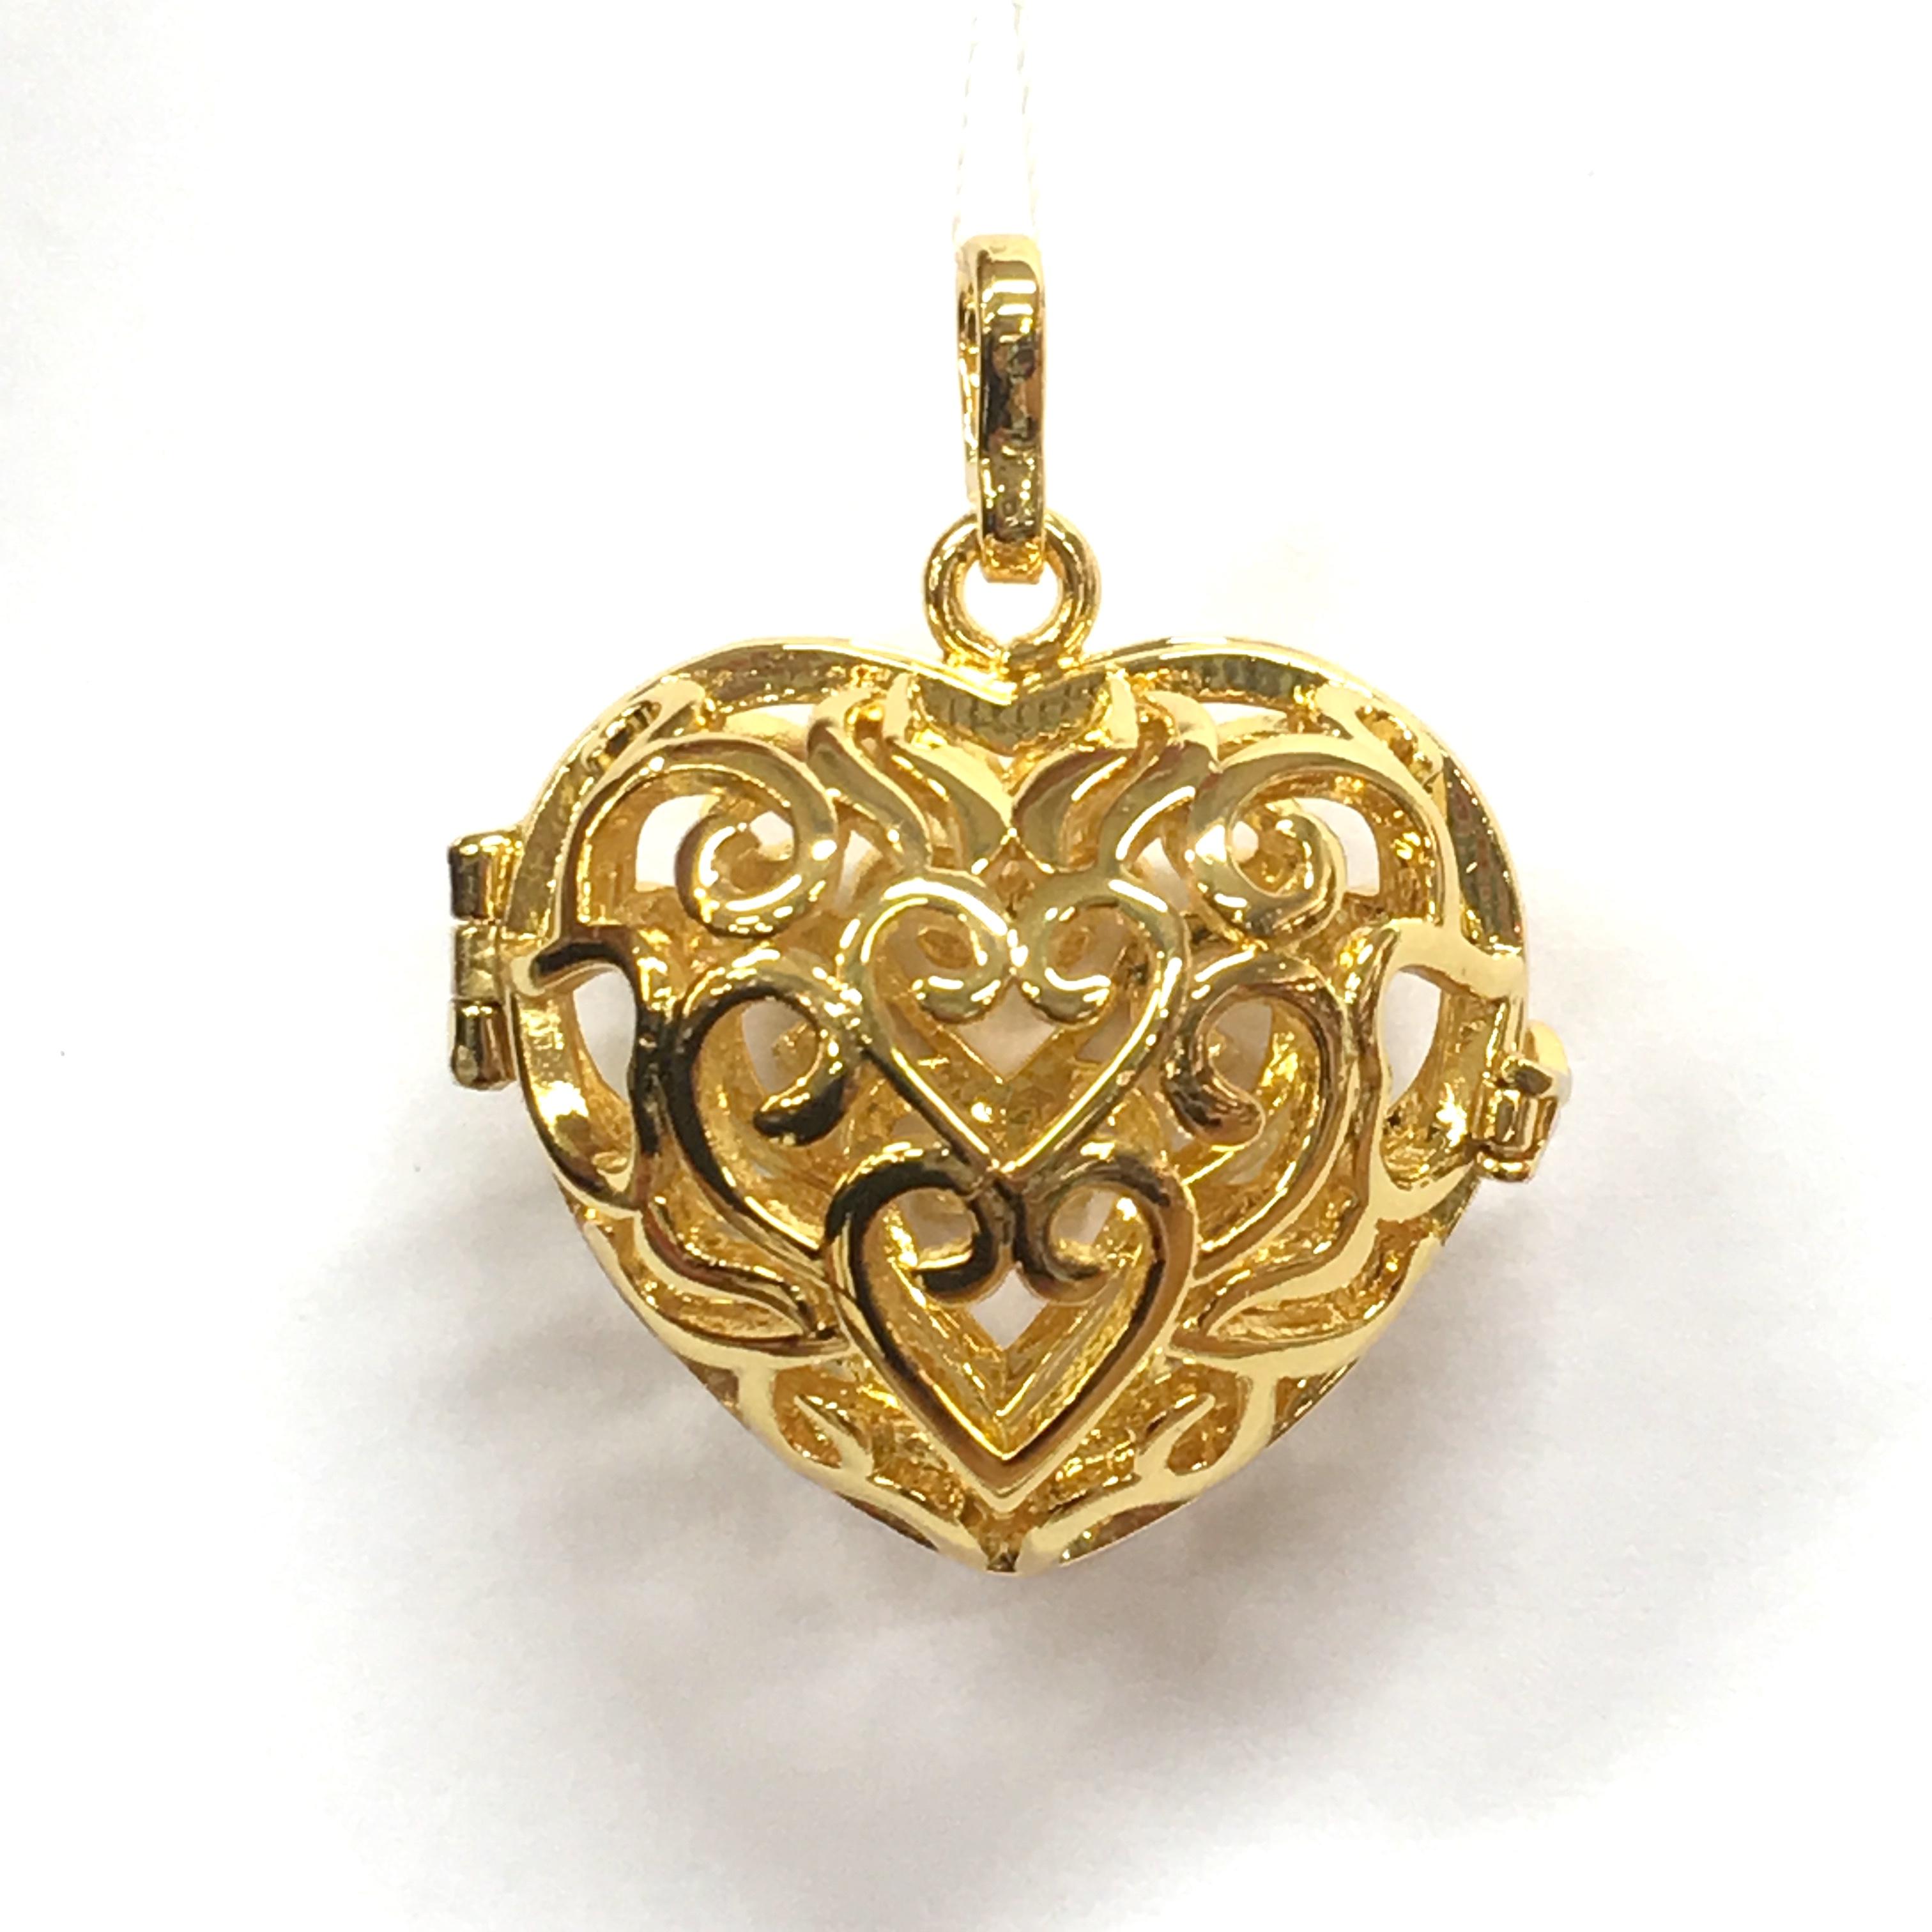 Aroomiteraapia ripats kuldne süda, 18mm (2732)